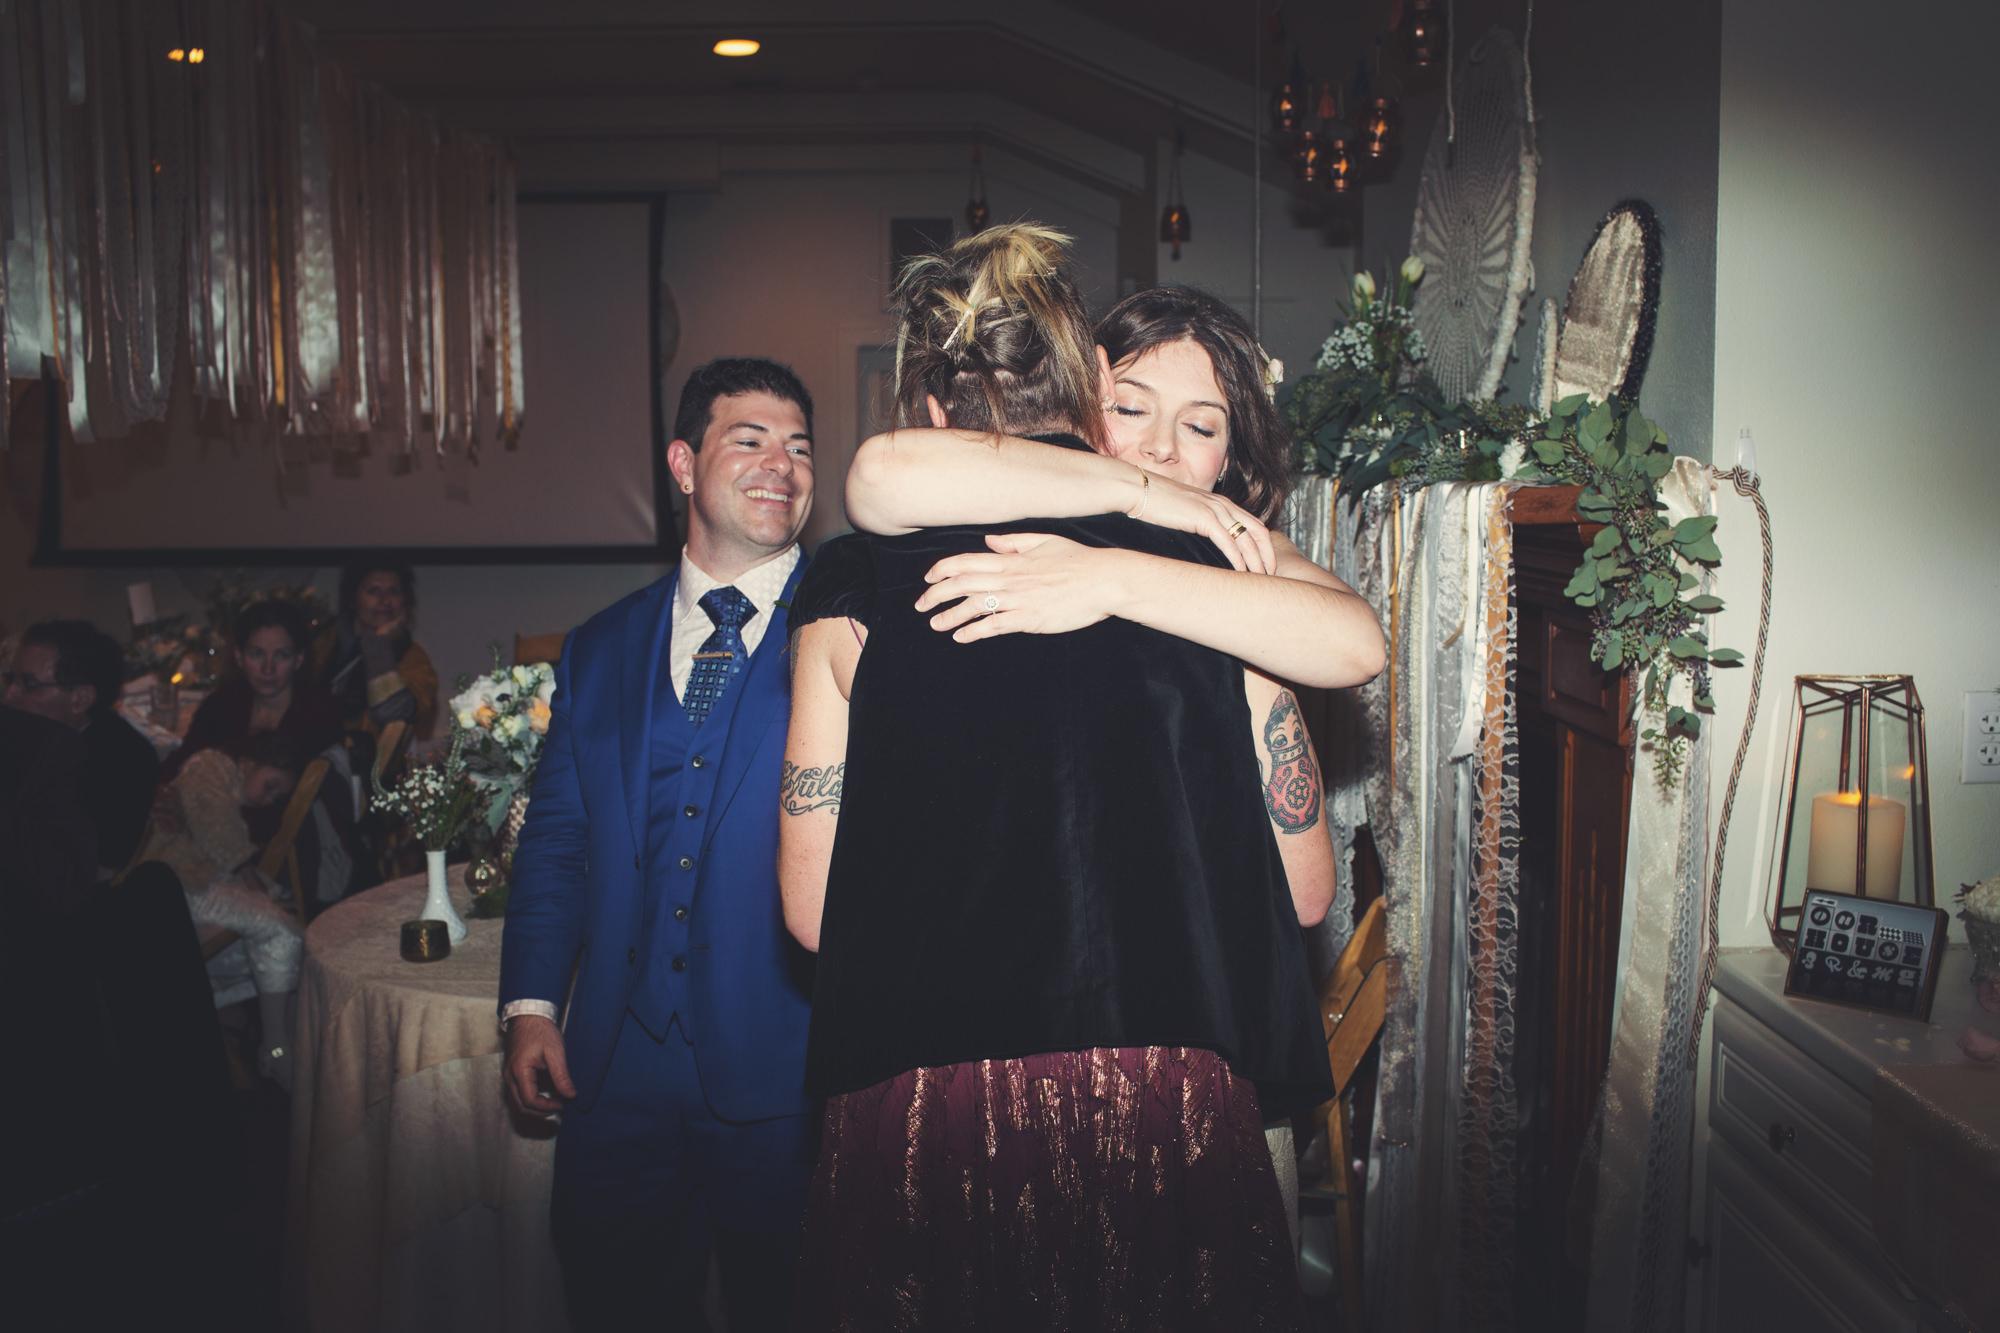 Little River Inn Wedding@Anne-Claire Brun 229